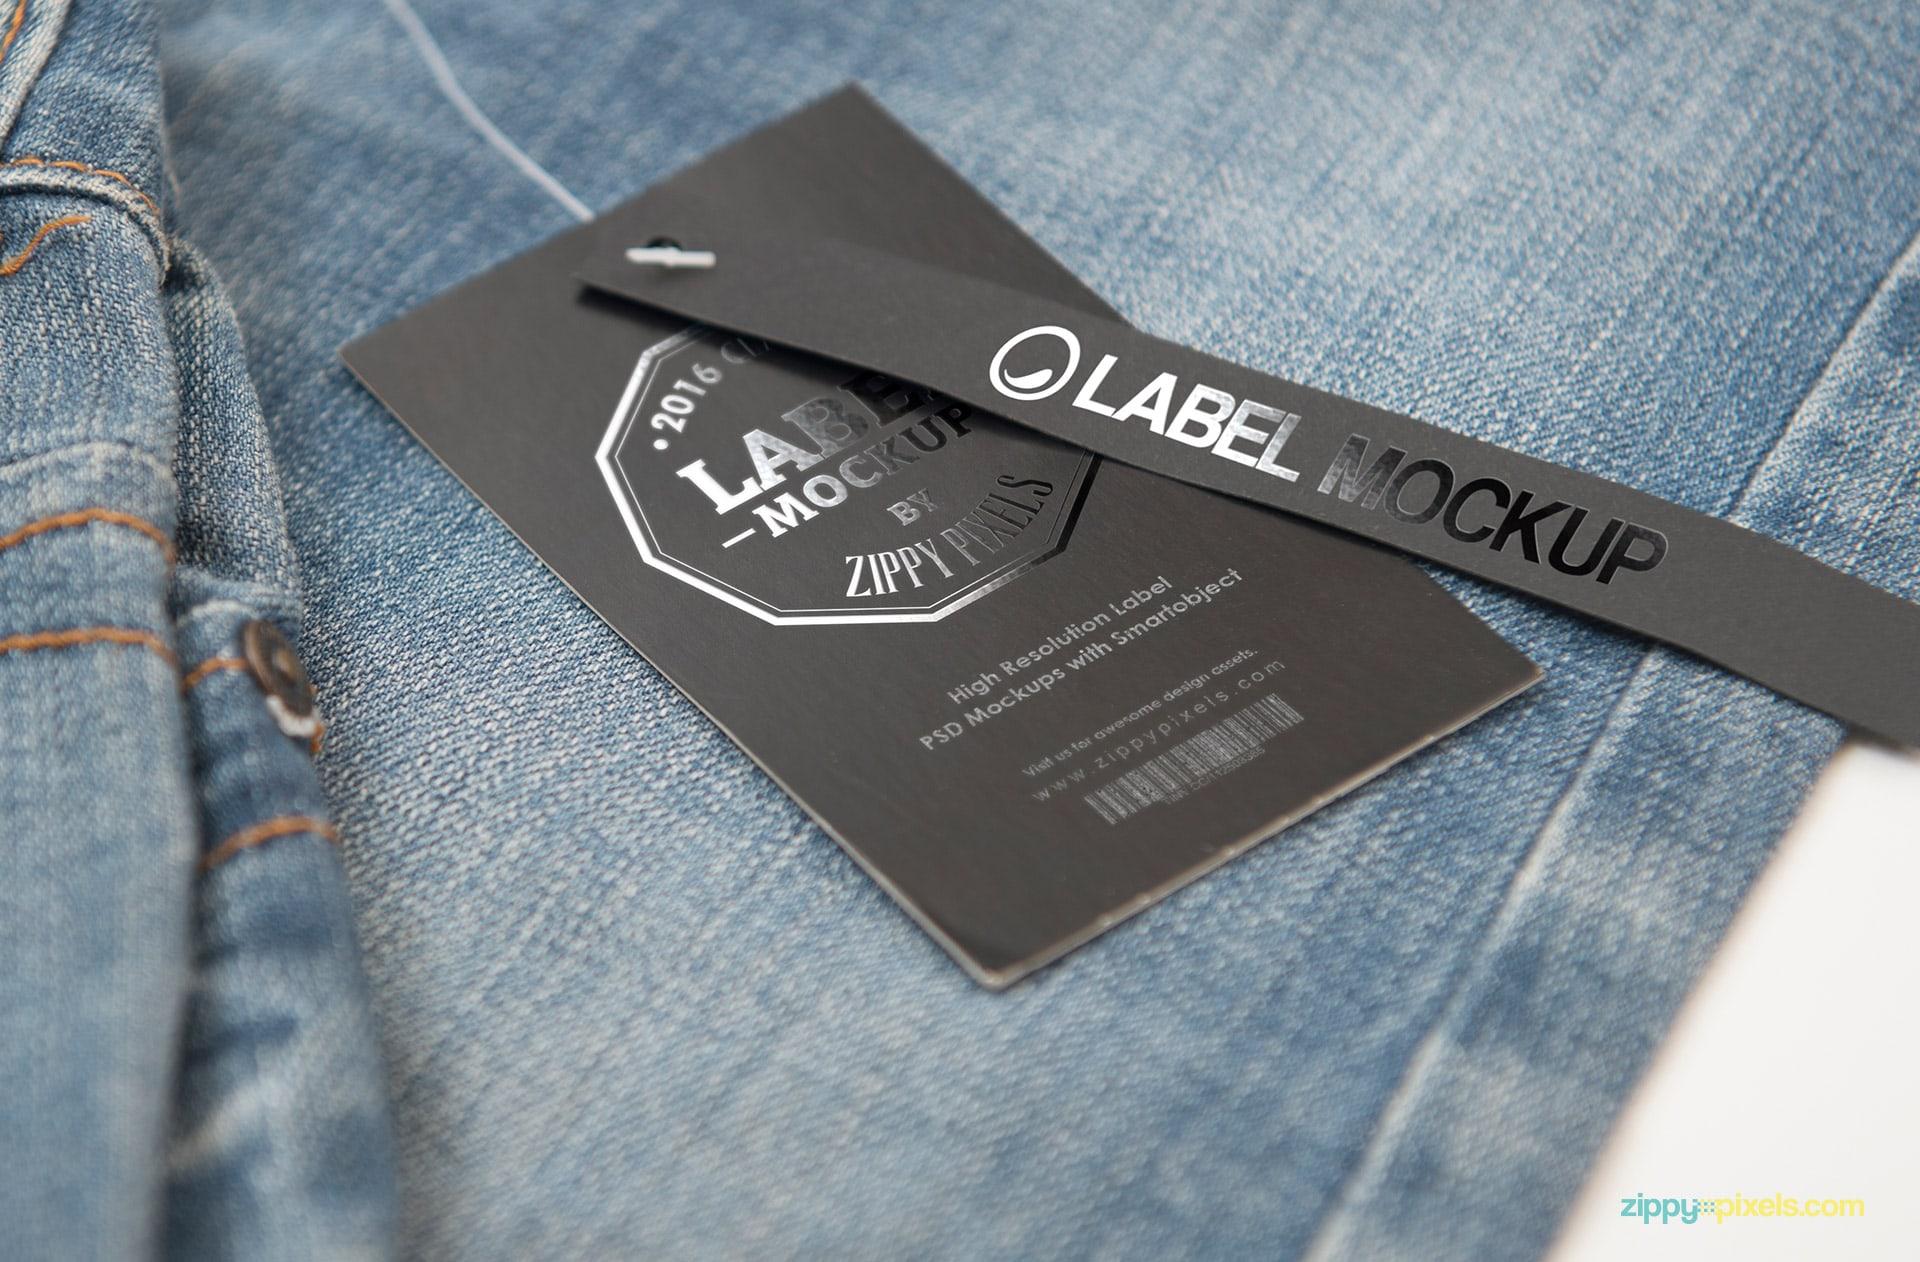 13-product-tag-mockup-824x542